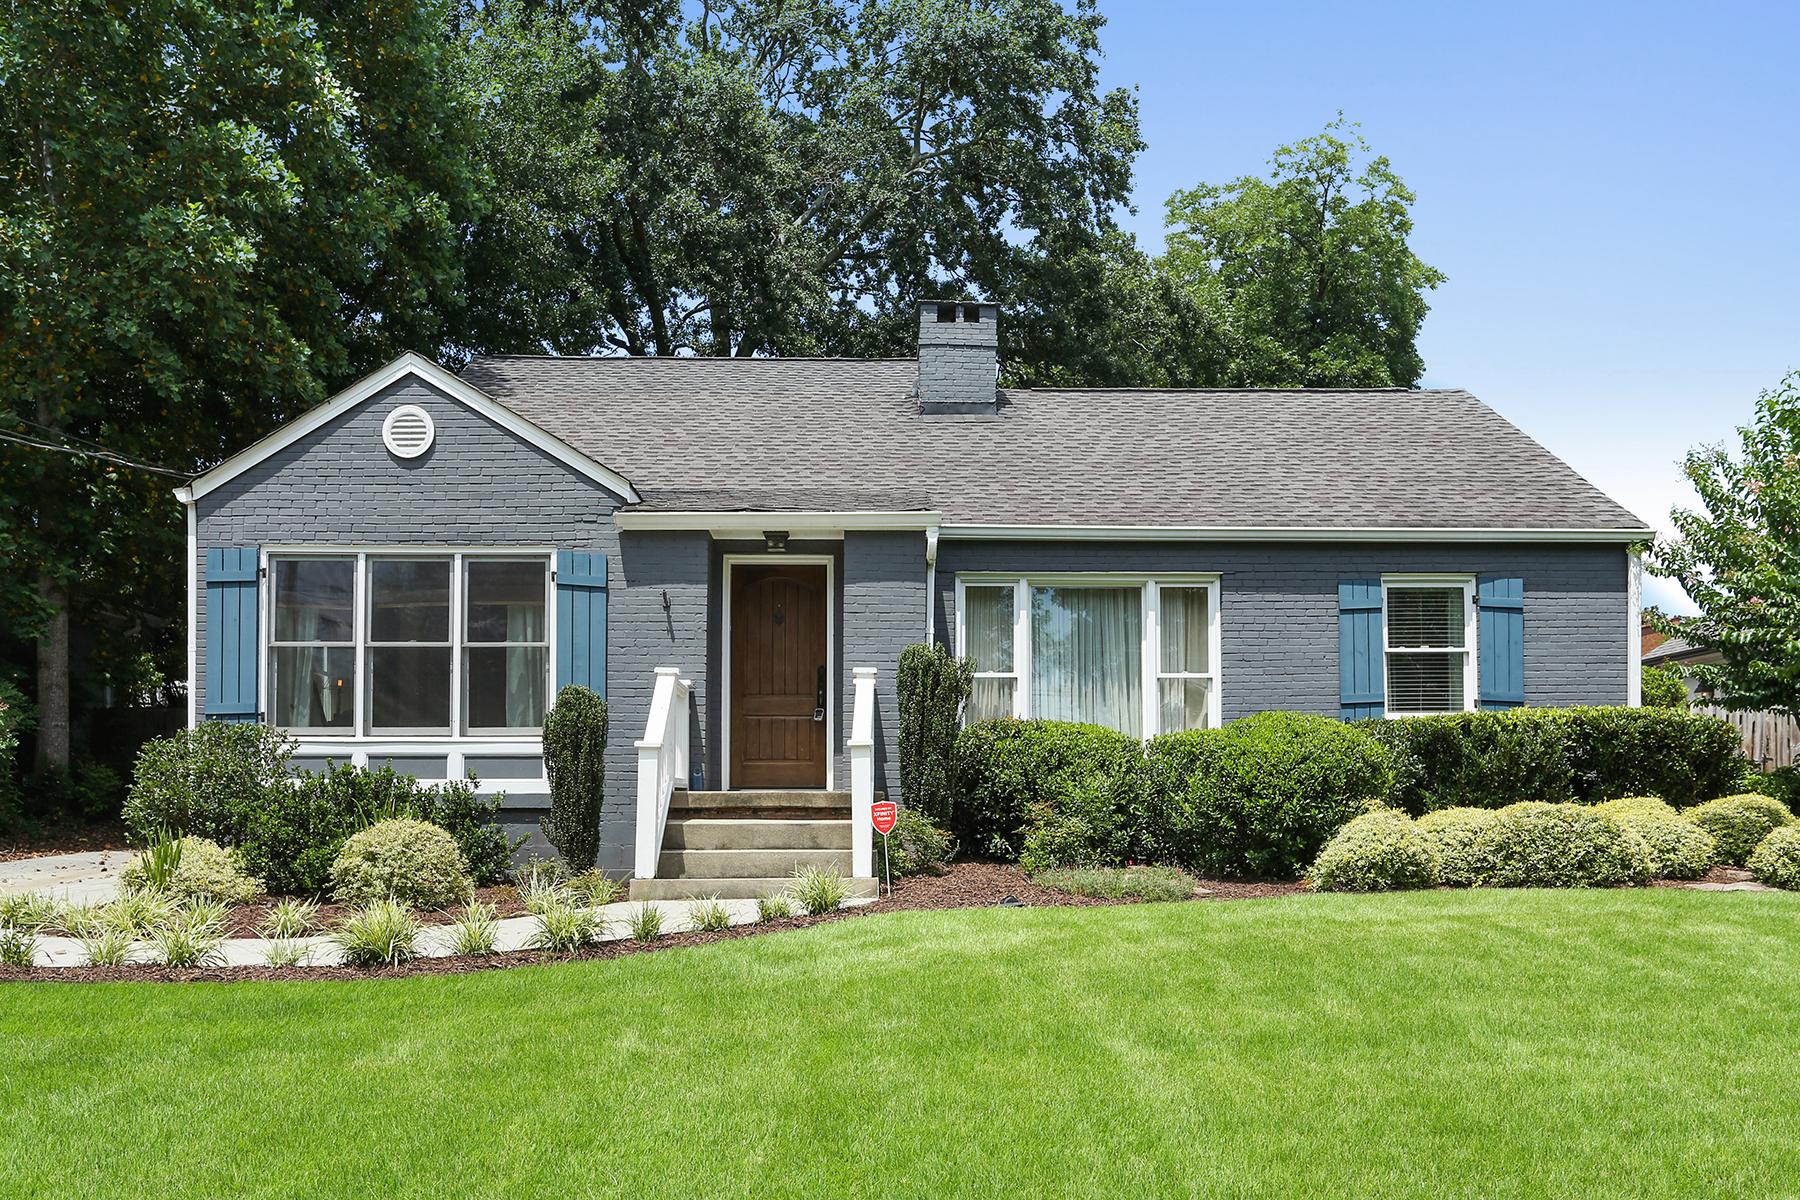 Single Family Home for Sale at Beautiful Home in North Buckhead 212 Midvale Pl Atlanta, Georgia 30324 United States